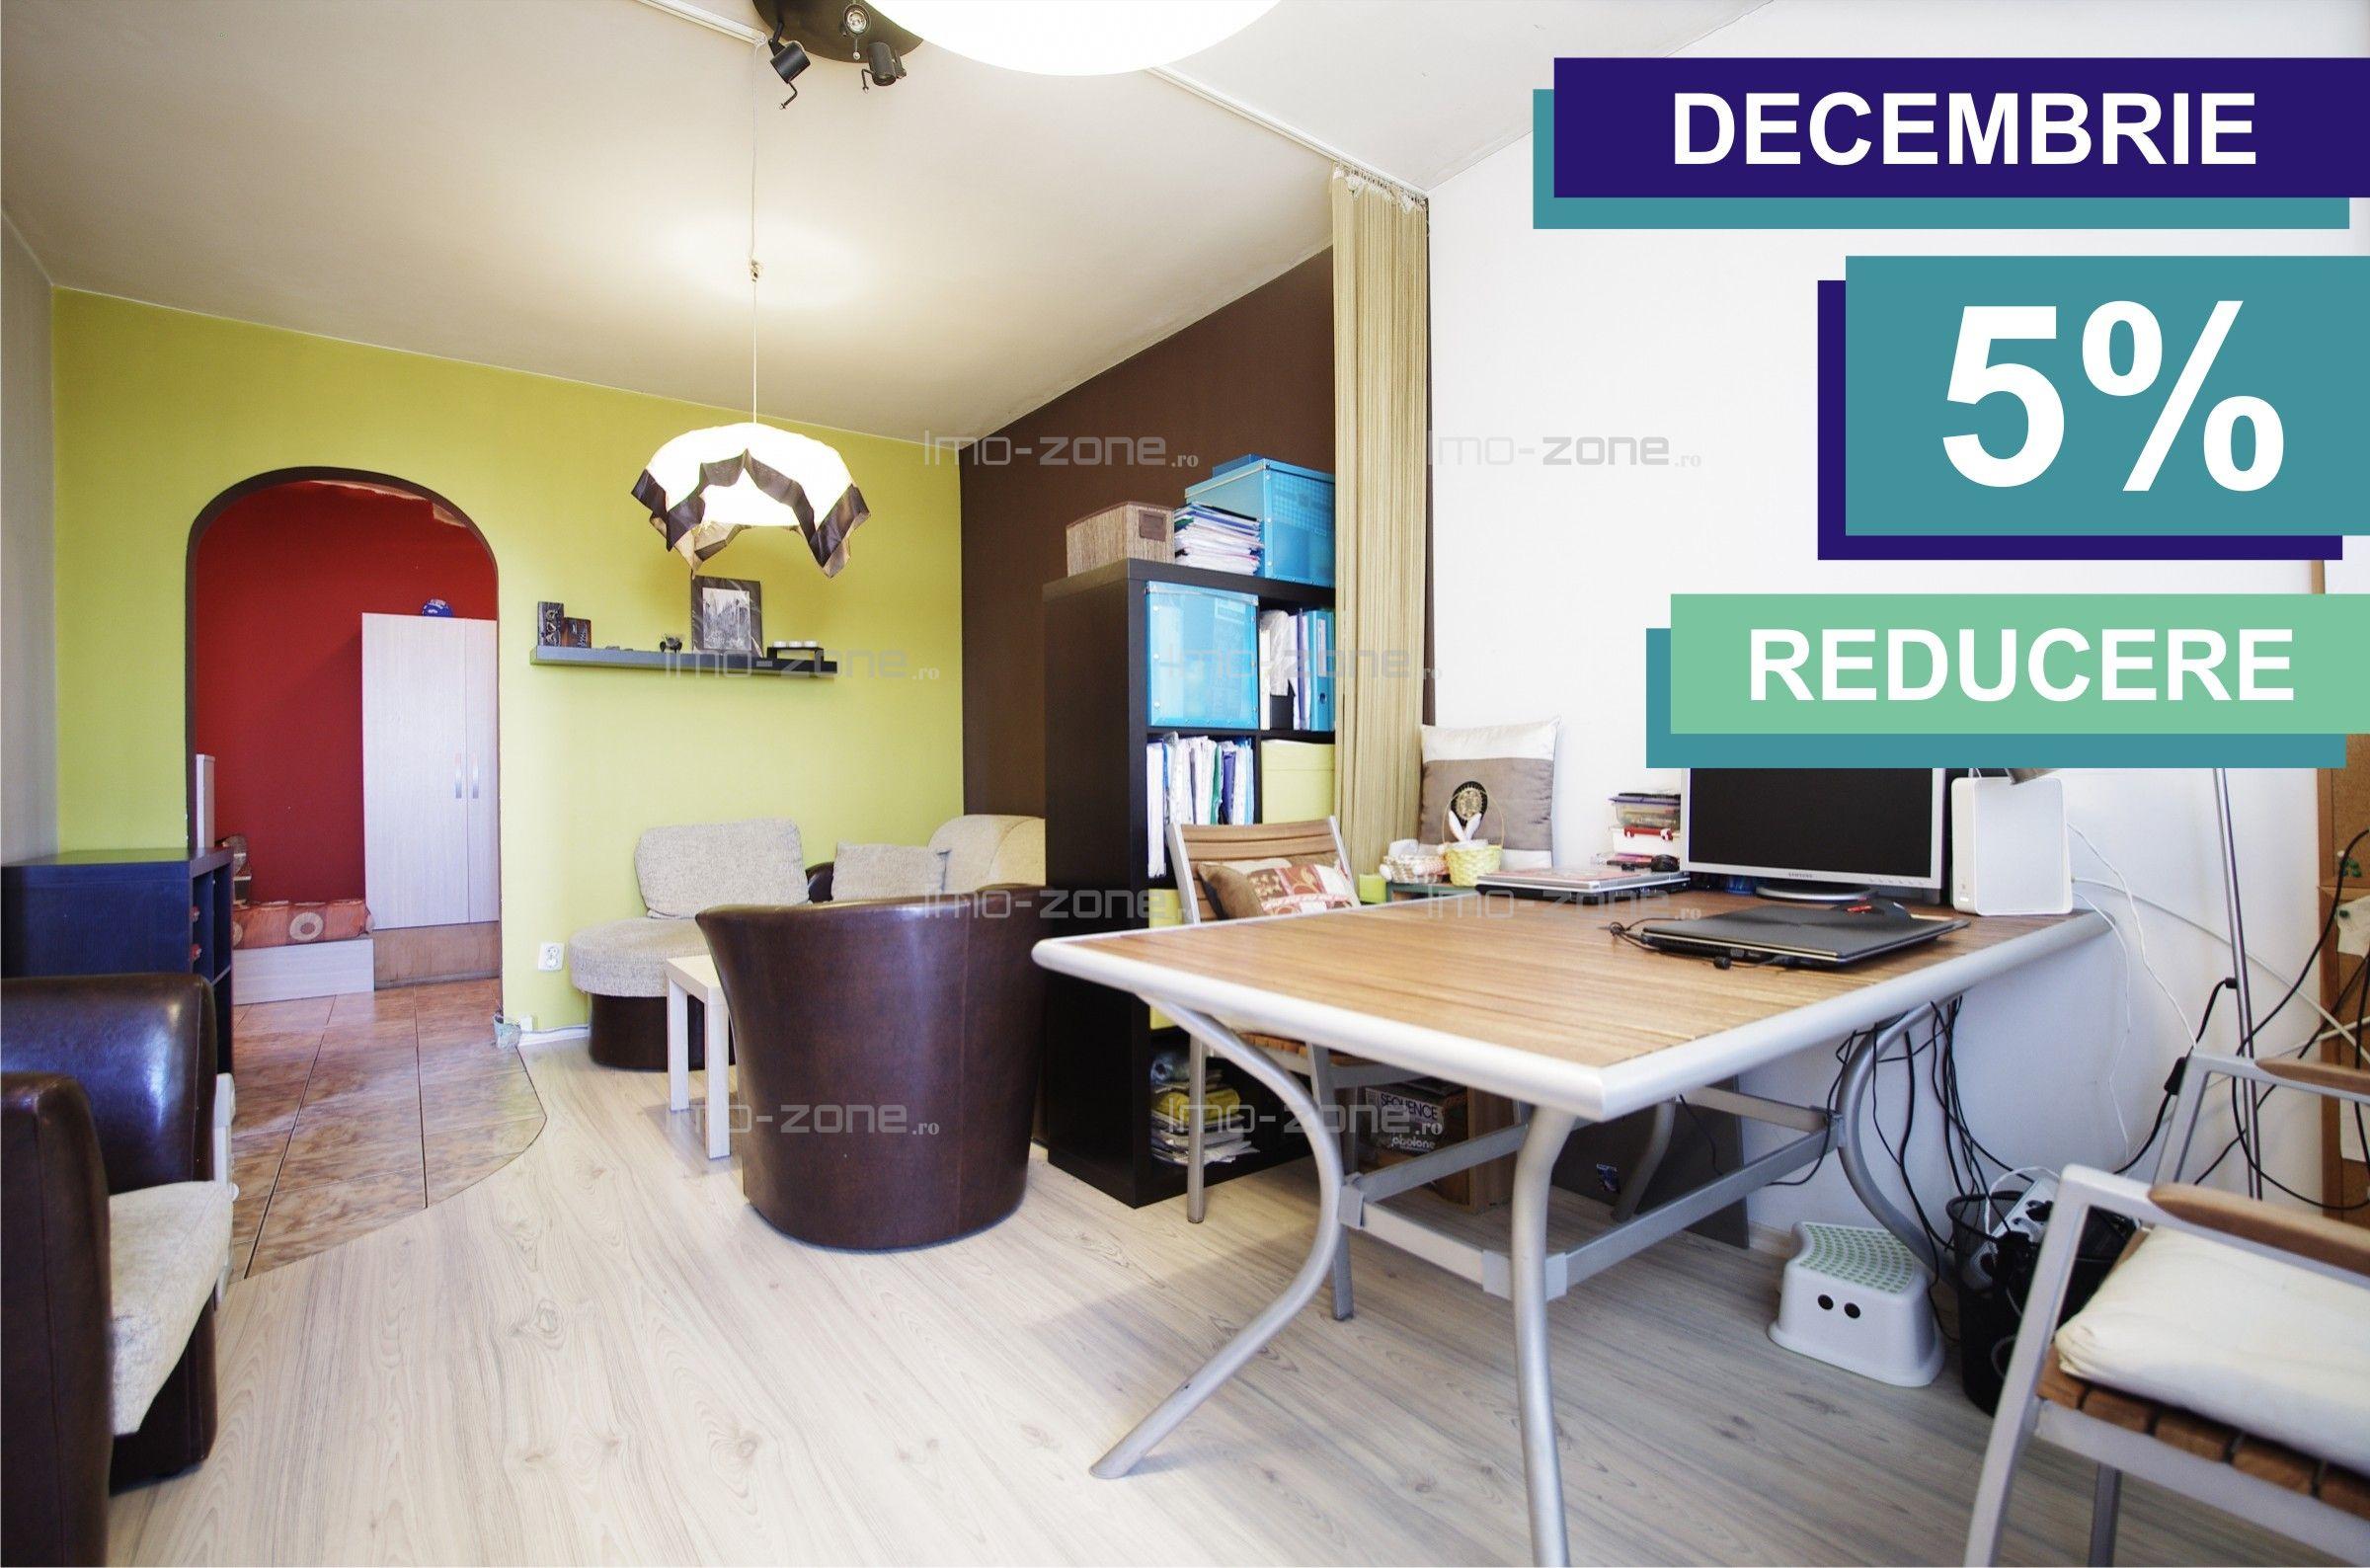 Apartament 2 camere Drumul Taberei, Gradinita 273, 5 minute tramvai 41